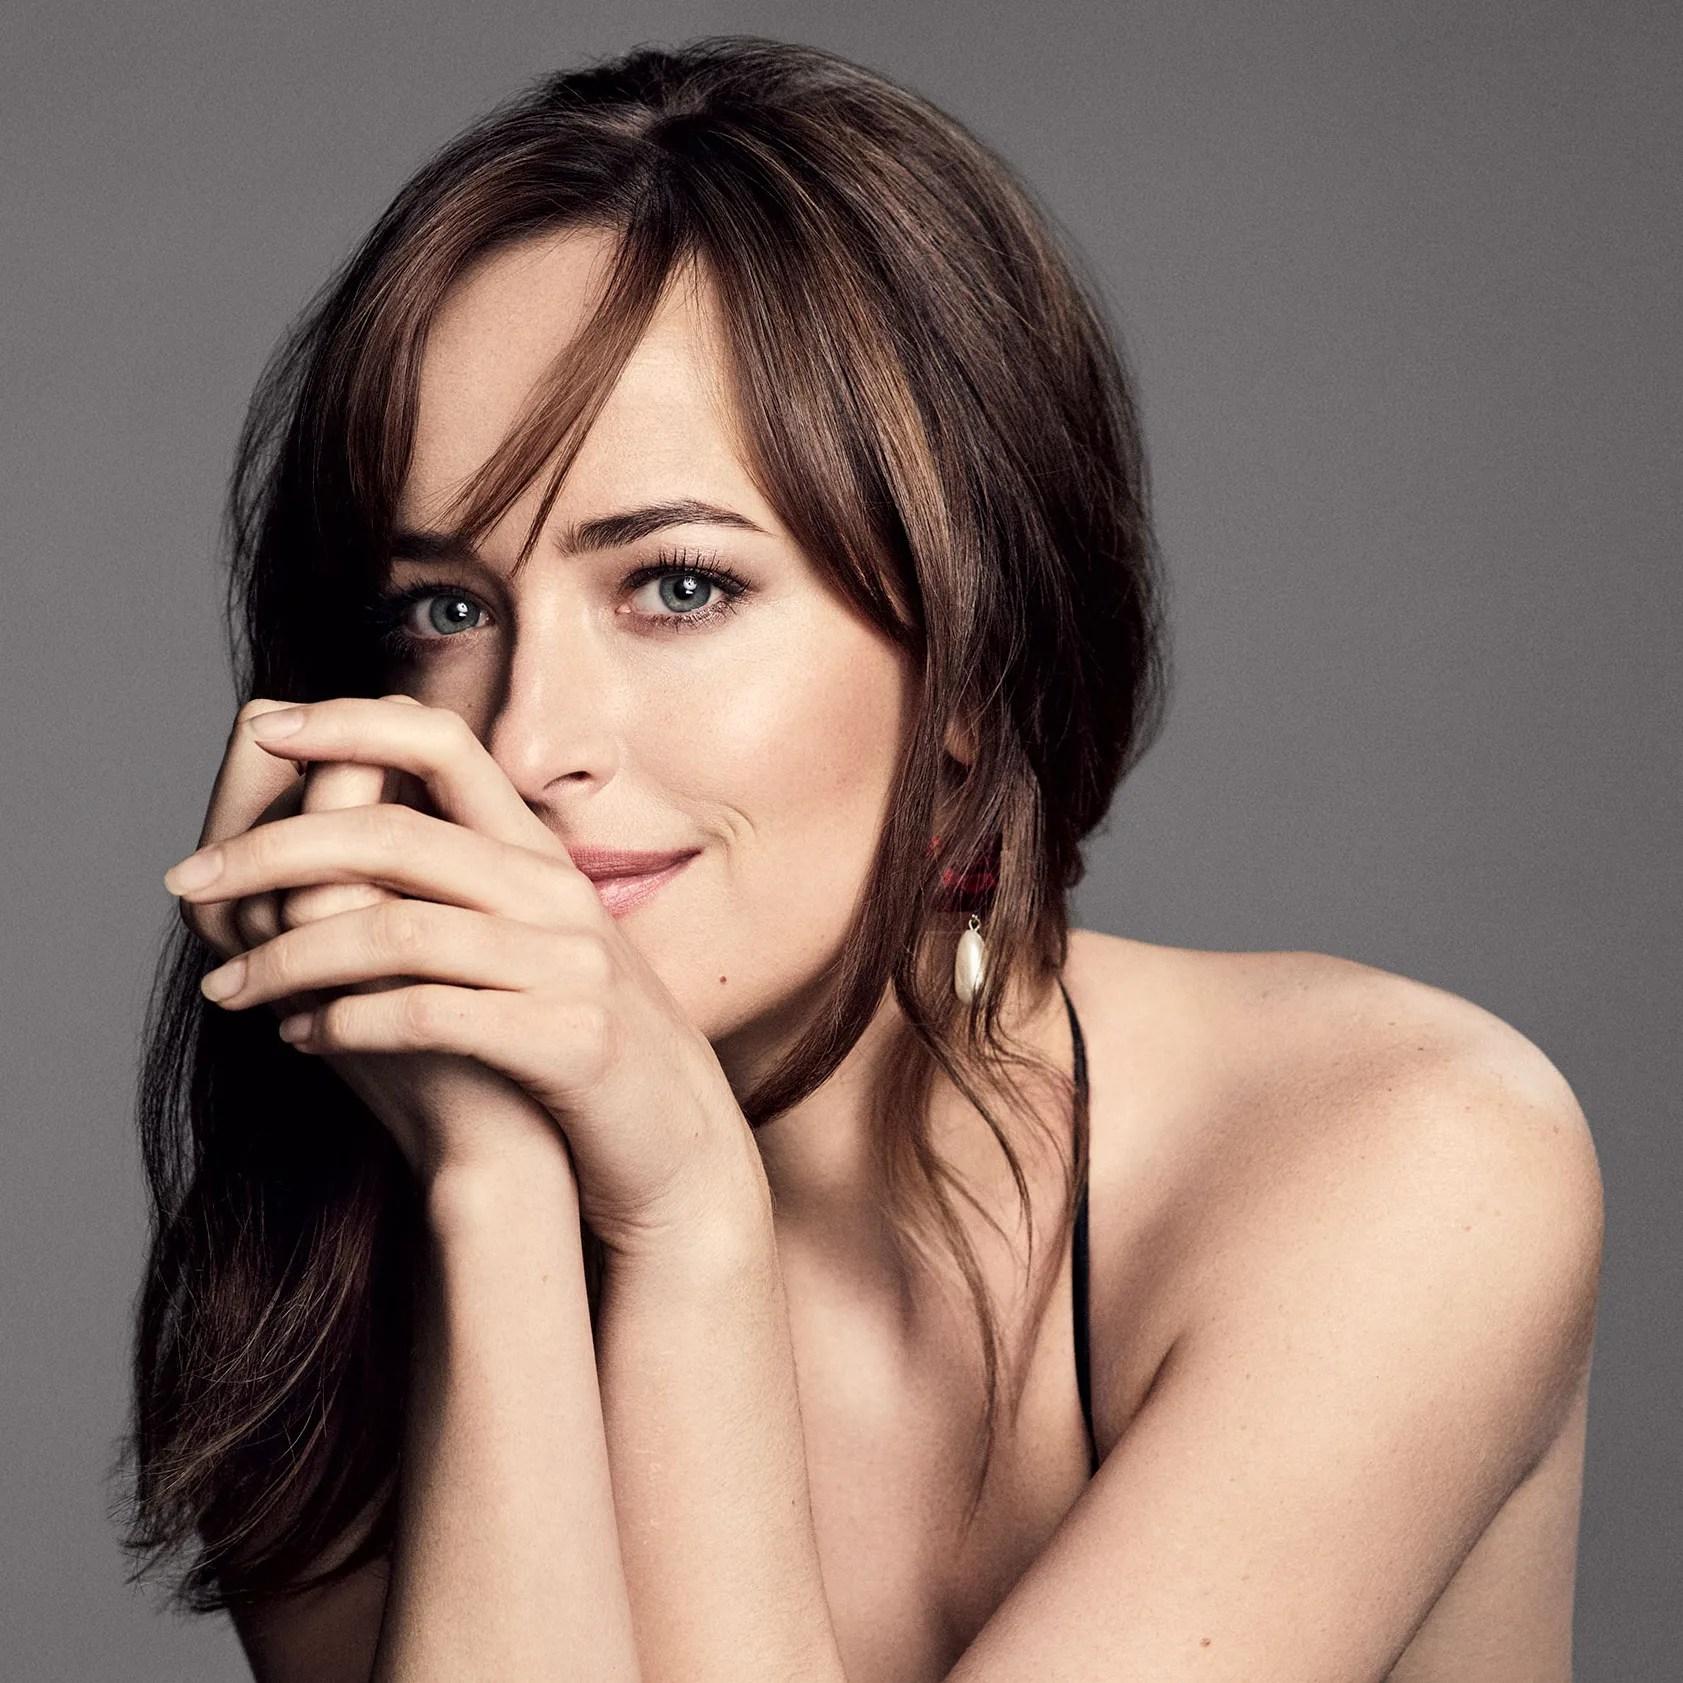 Dakota Johnsons Beauty Routine Is Shockingly Simple